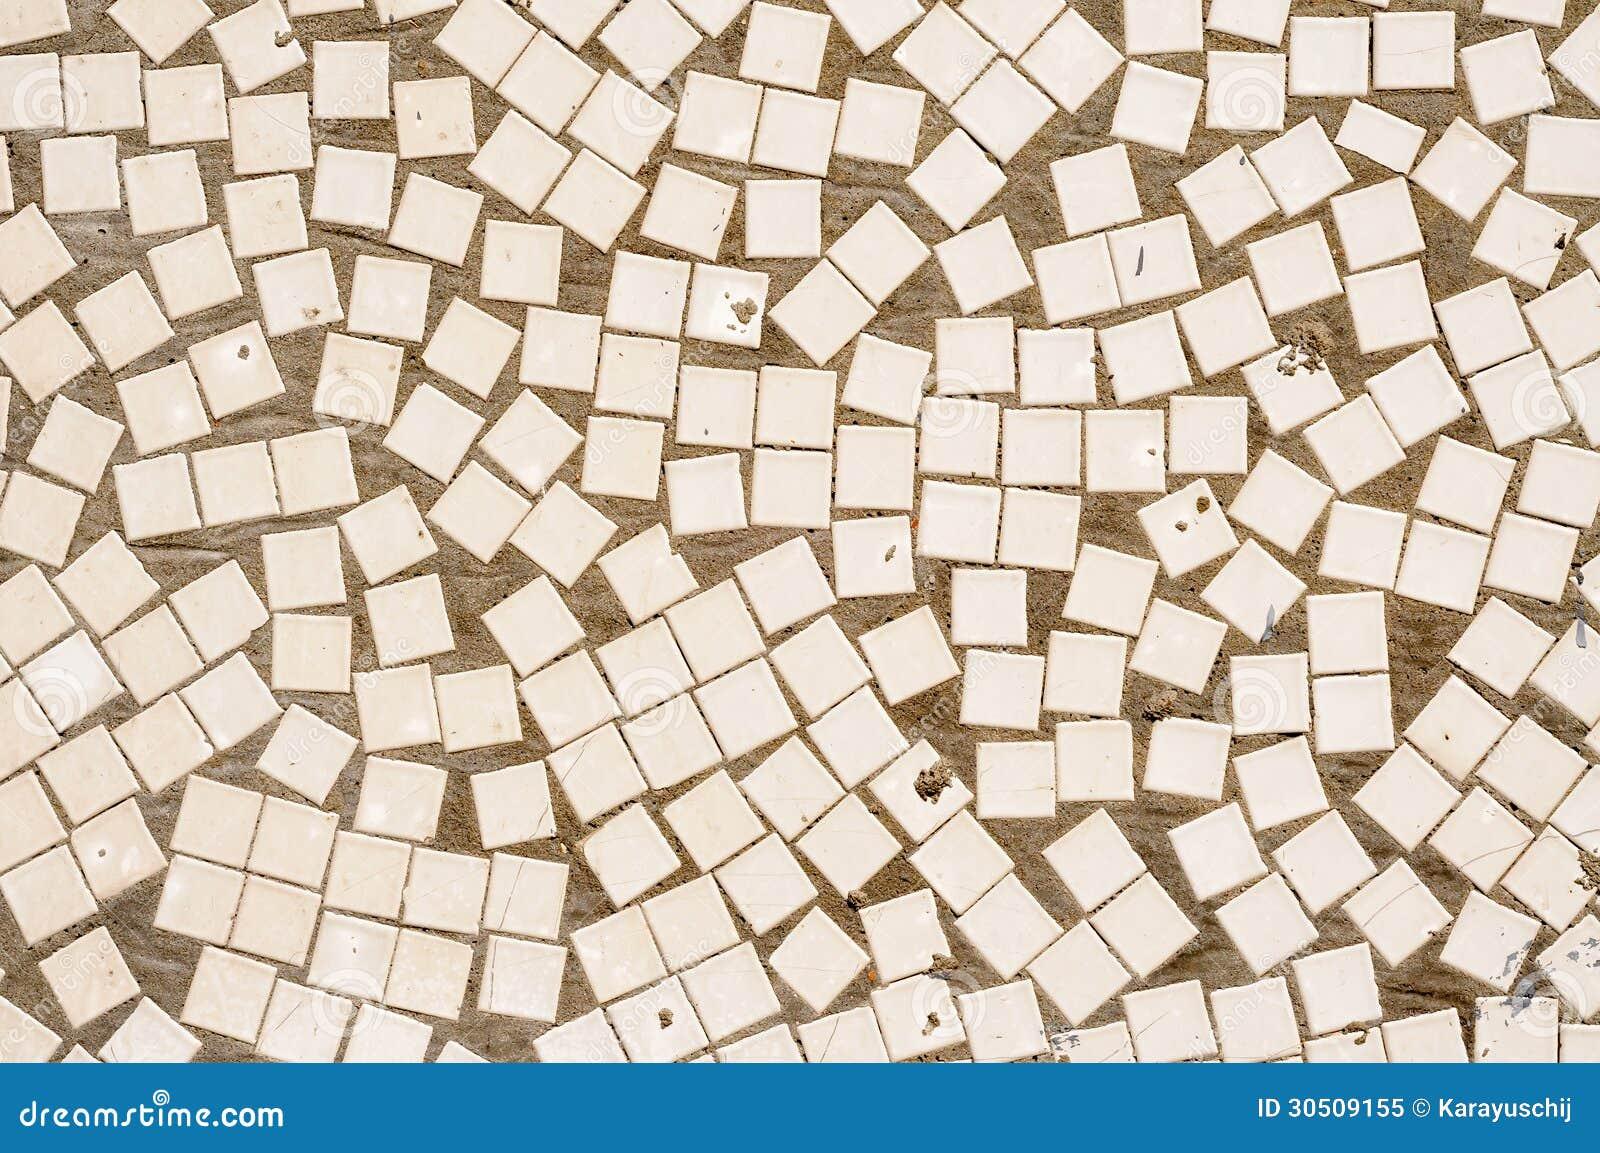 Irregular Mosaic Texture Royalty Free Stock Photo - Image ...